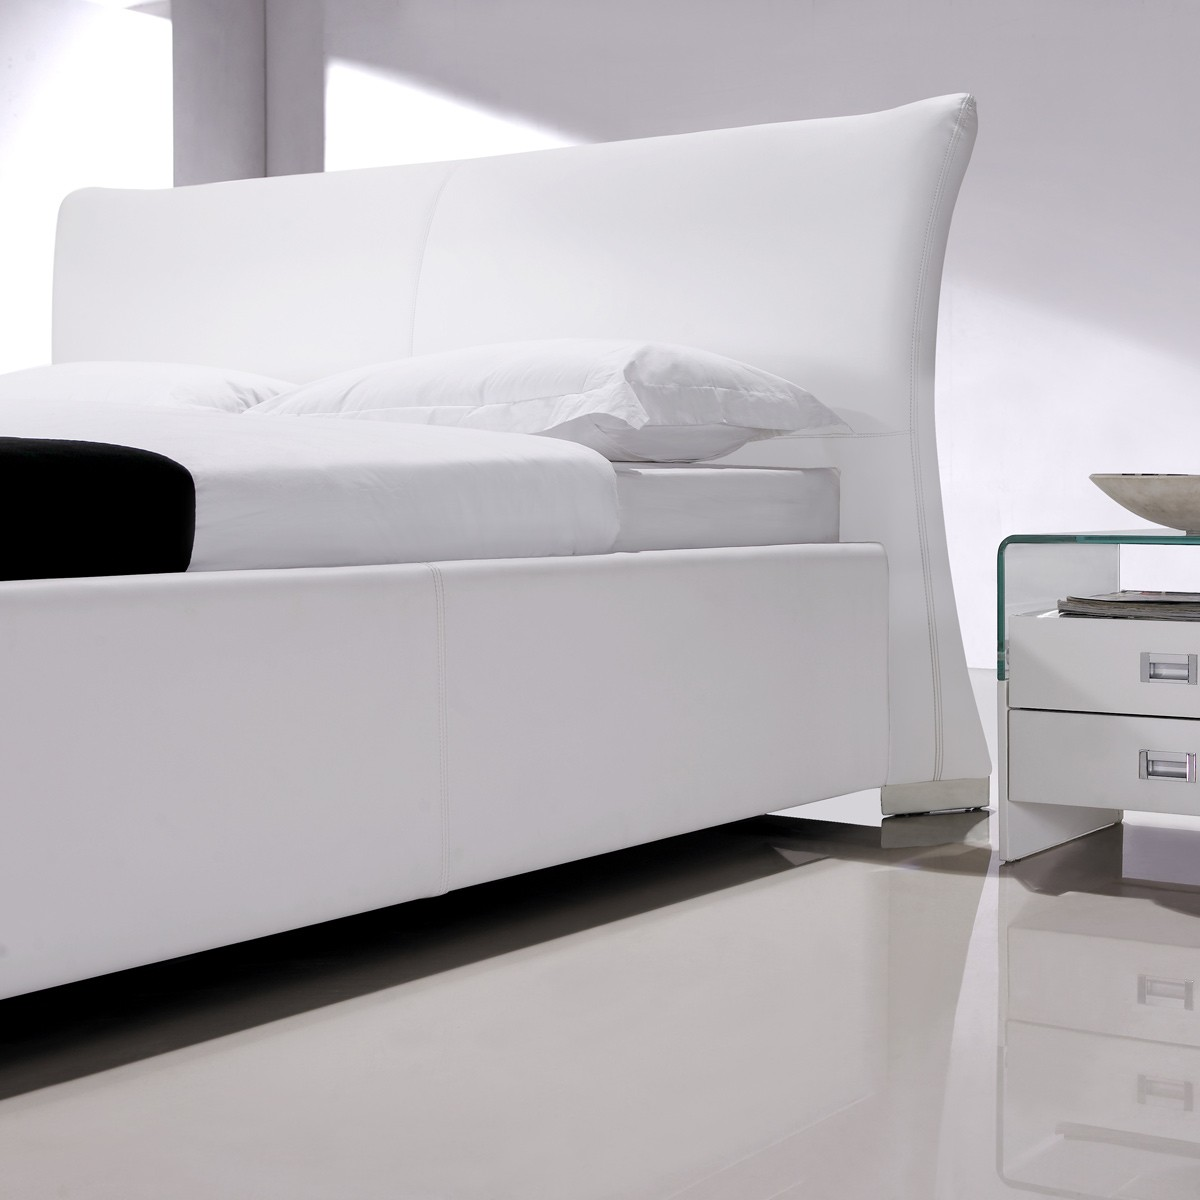 polsterbett holbaek 200x200 in kunstleder wei. Black Bedroom Furniture Sets. Home Design Ideas